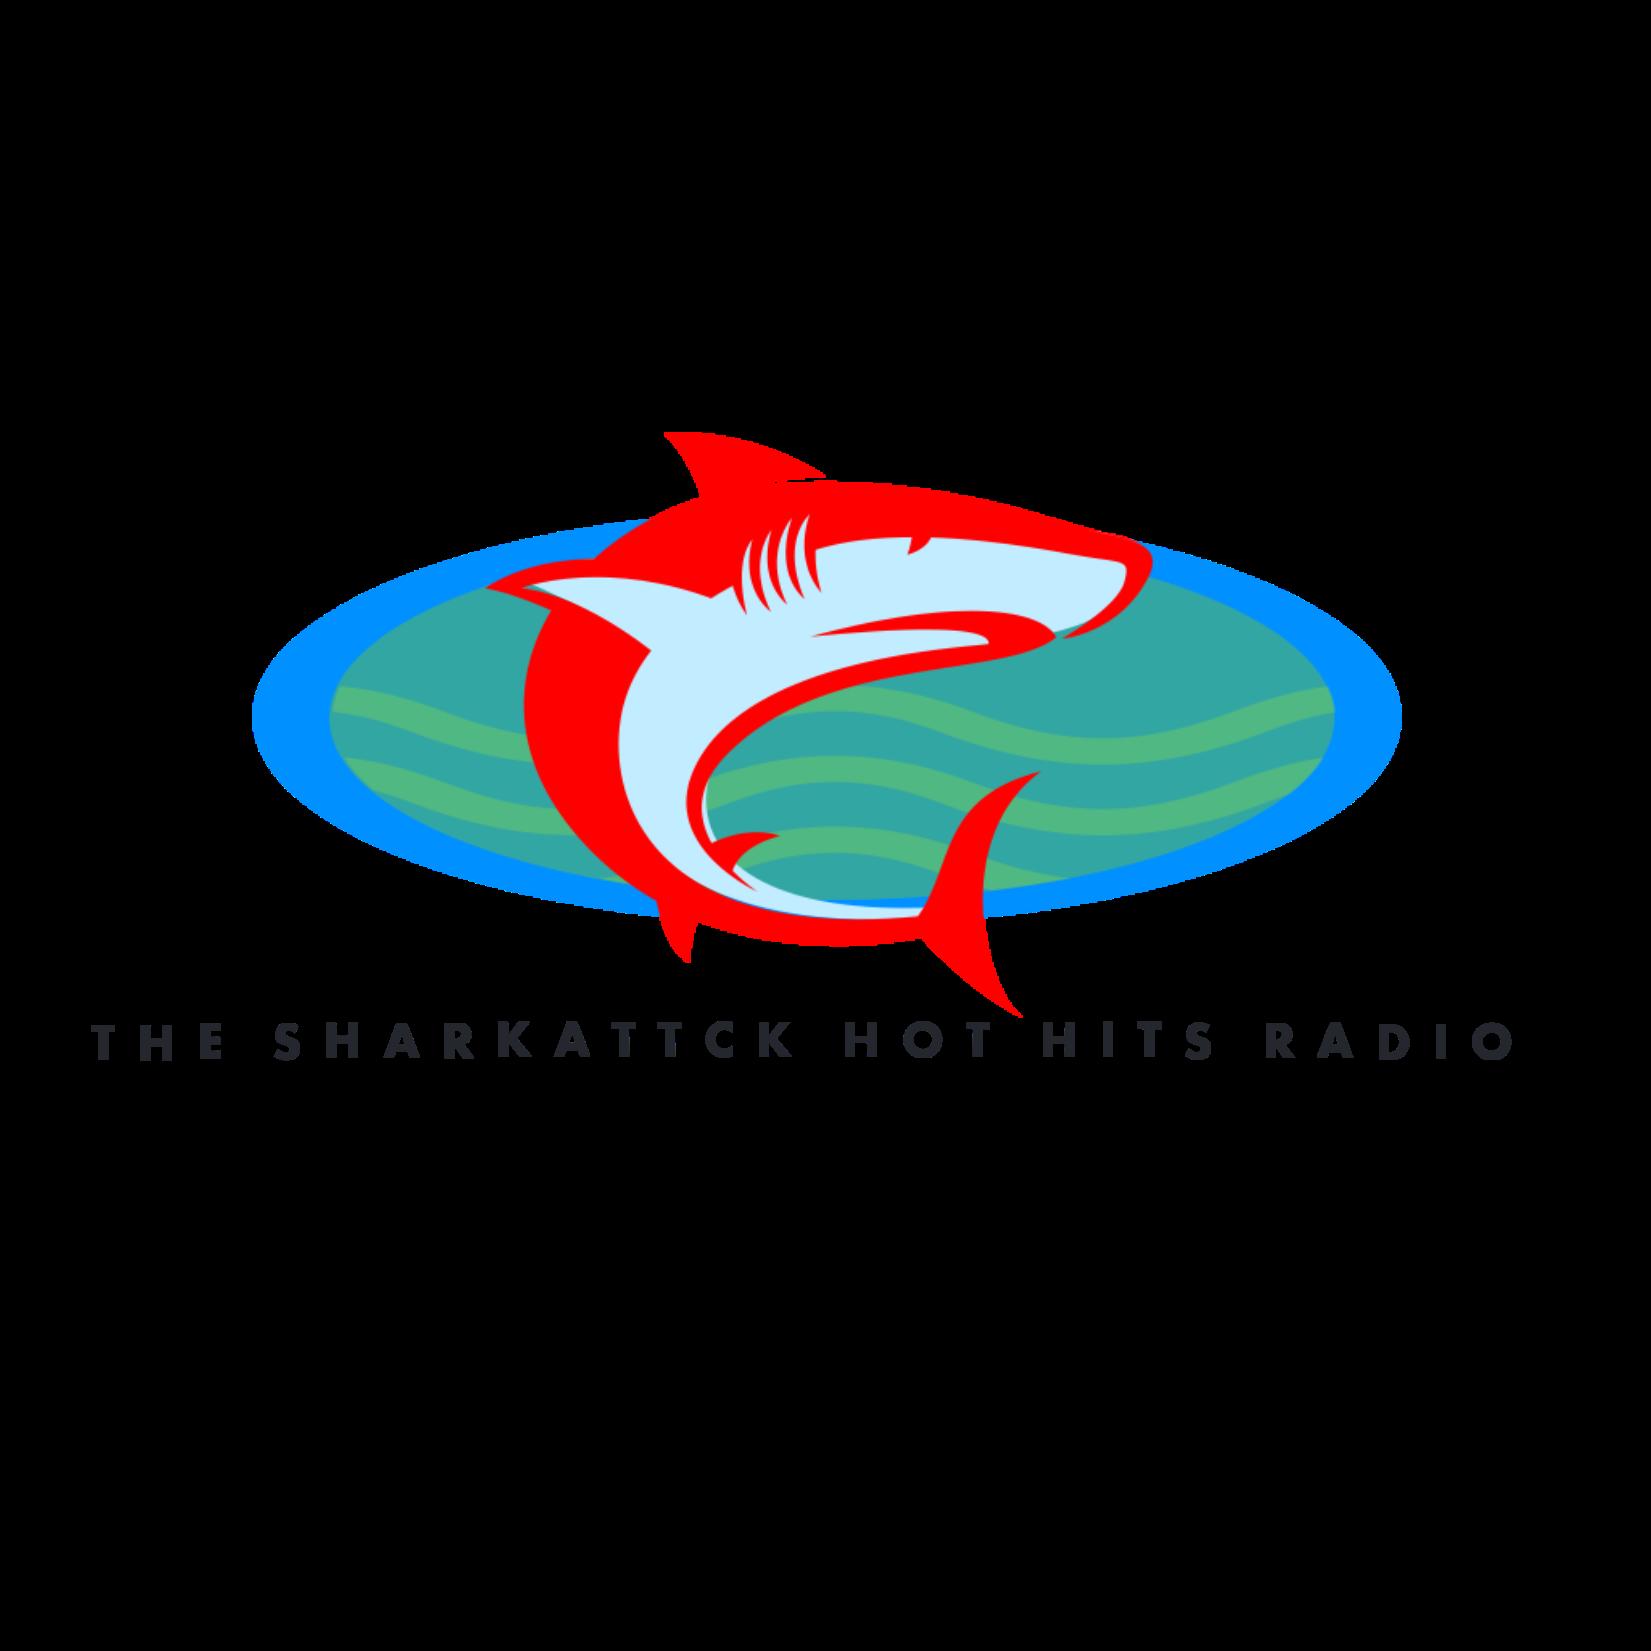 SHARKATTACK HITS RADIO